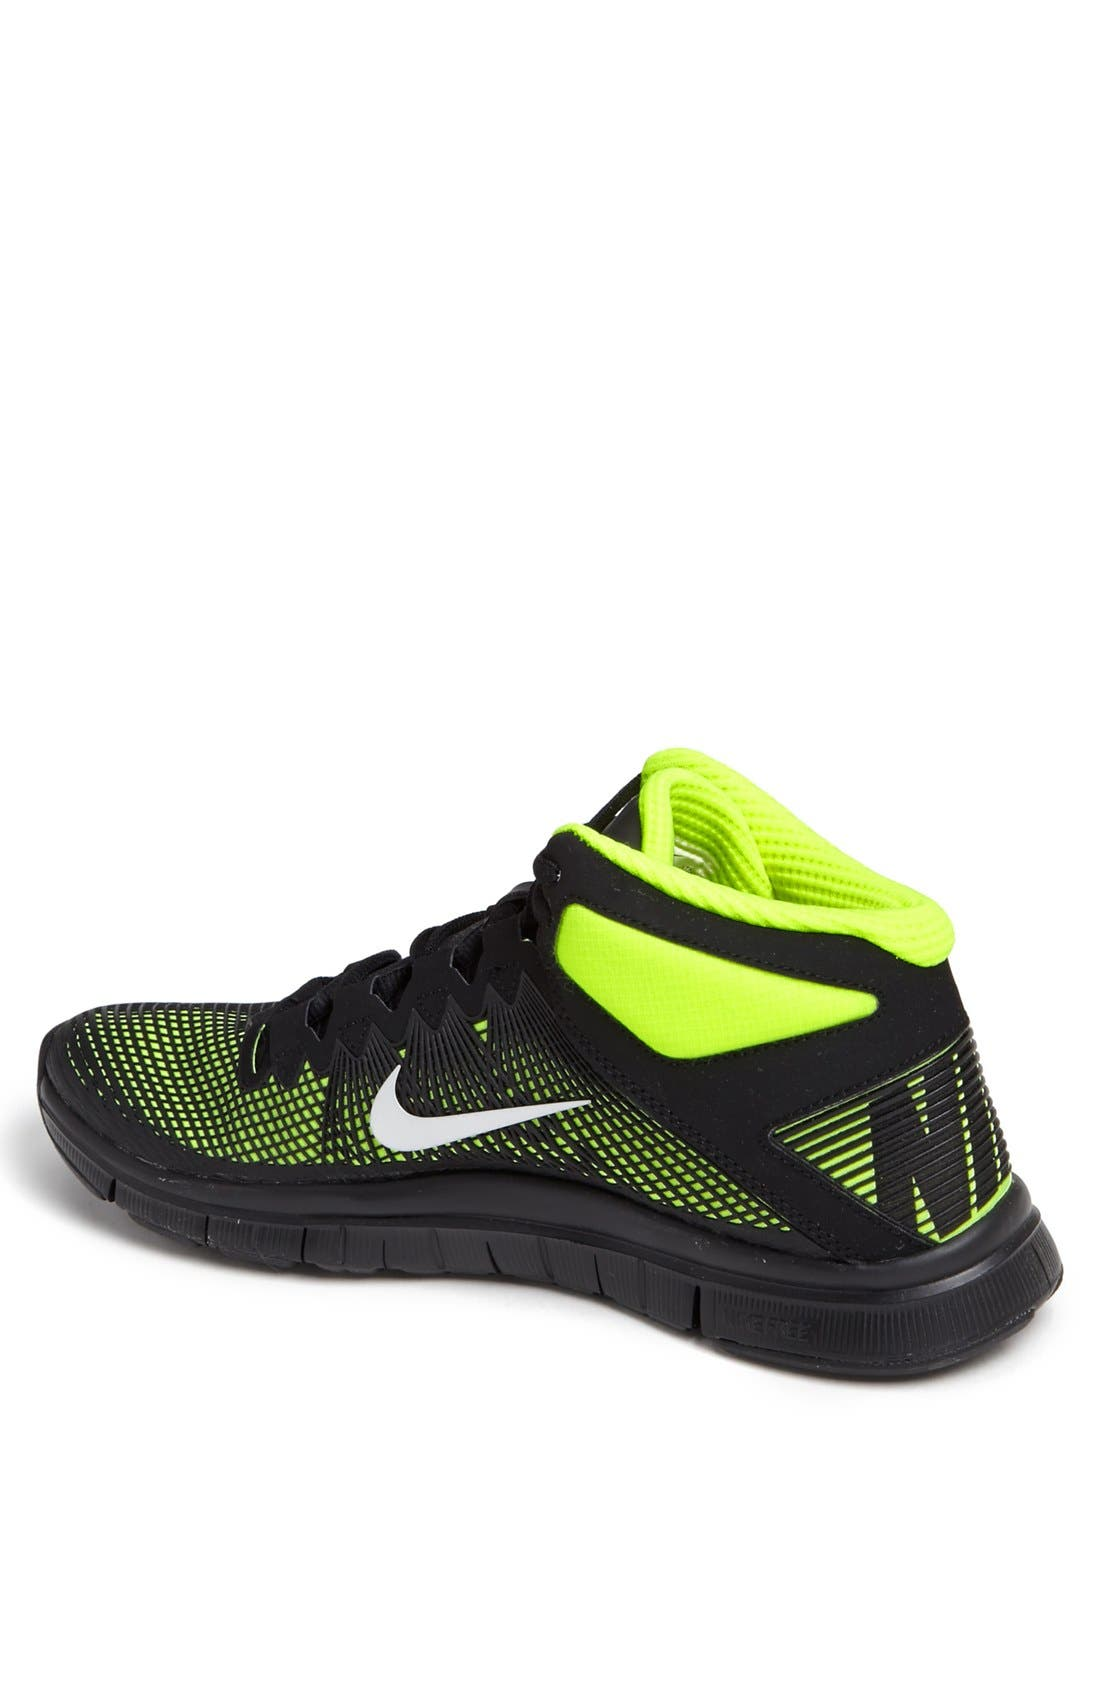 Alternate Image 2  - Nike 'Free Trainer 3.0 Mid' Training Shoe (Men)